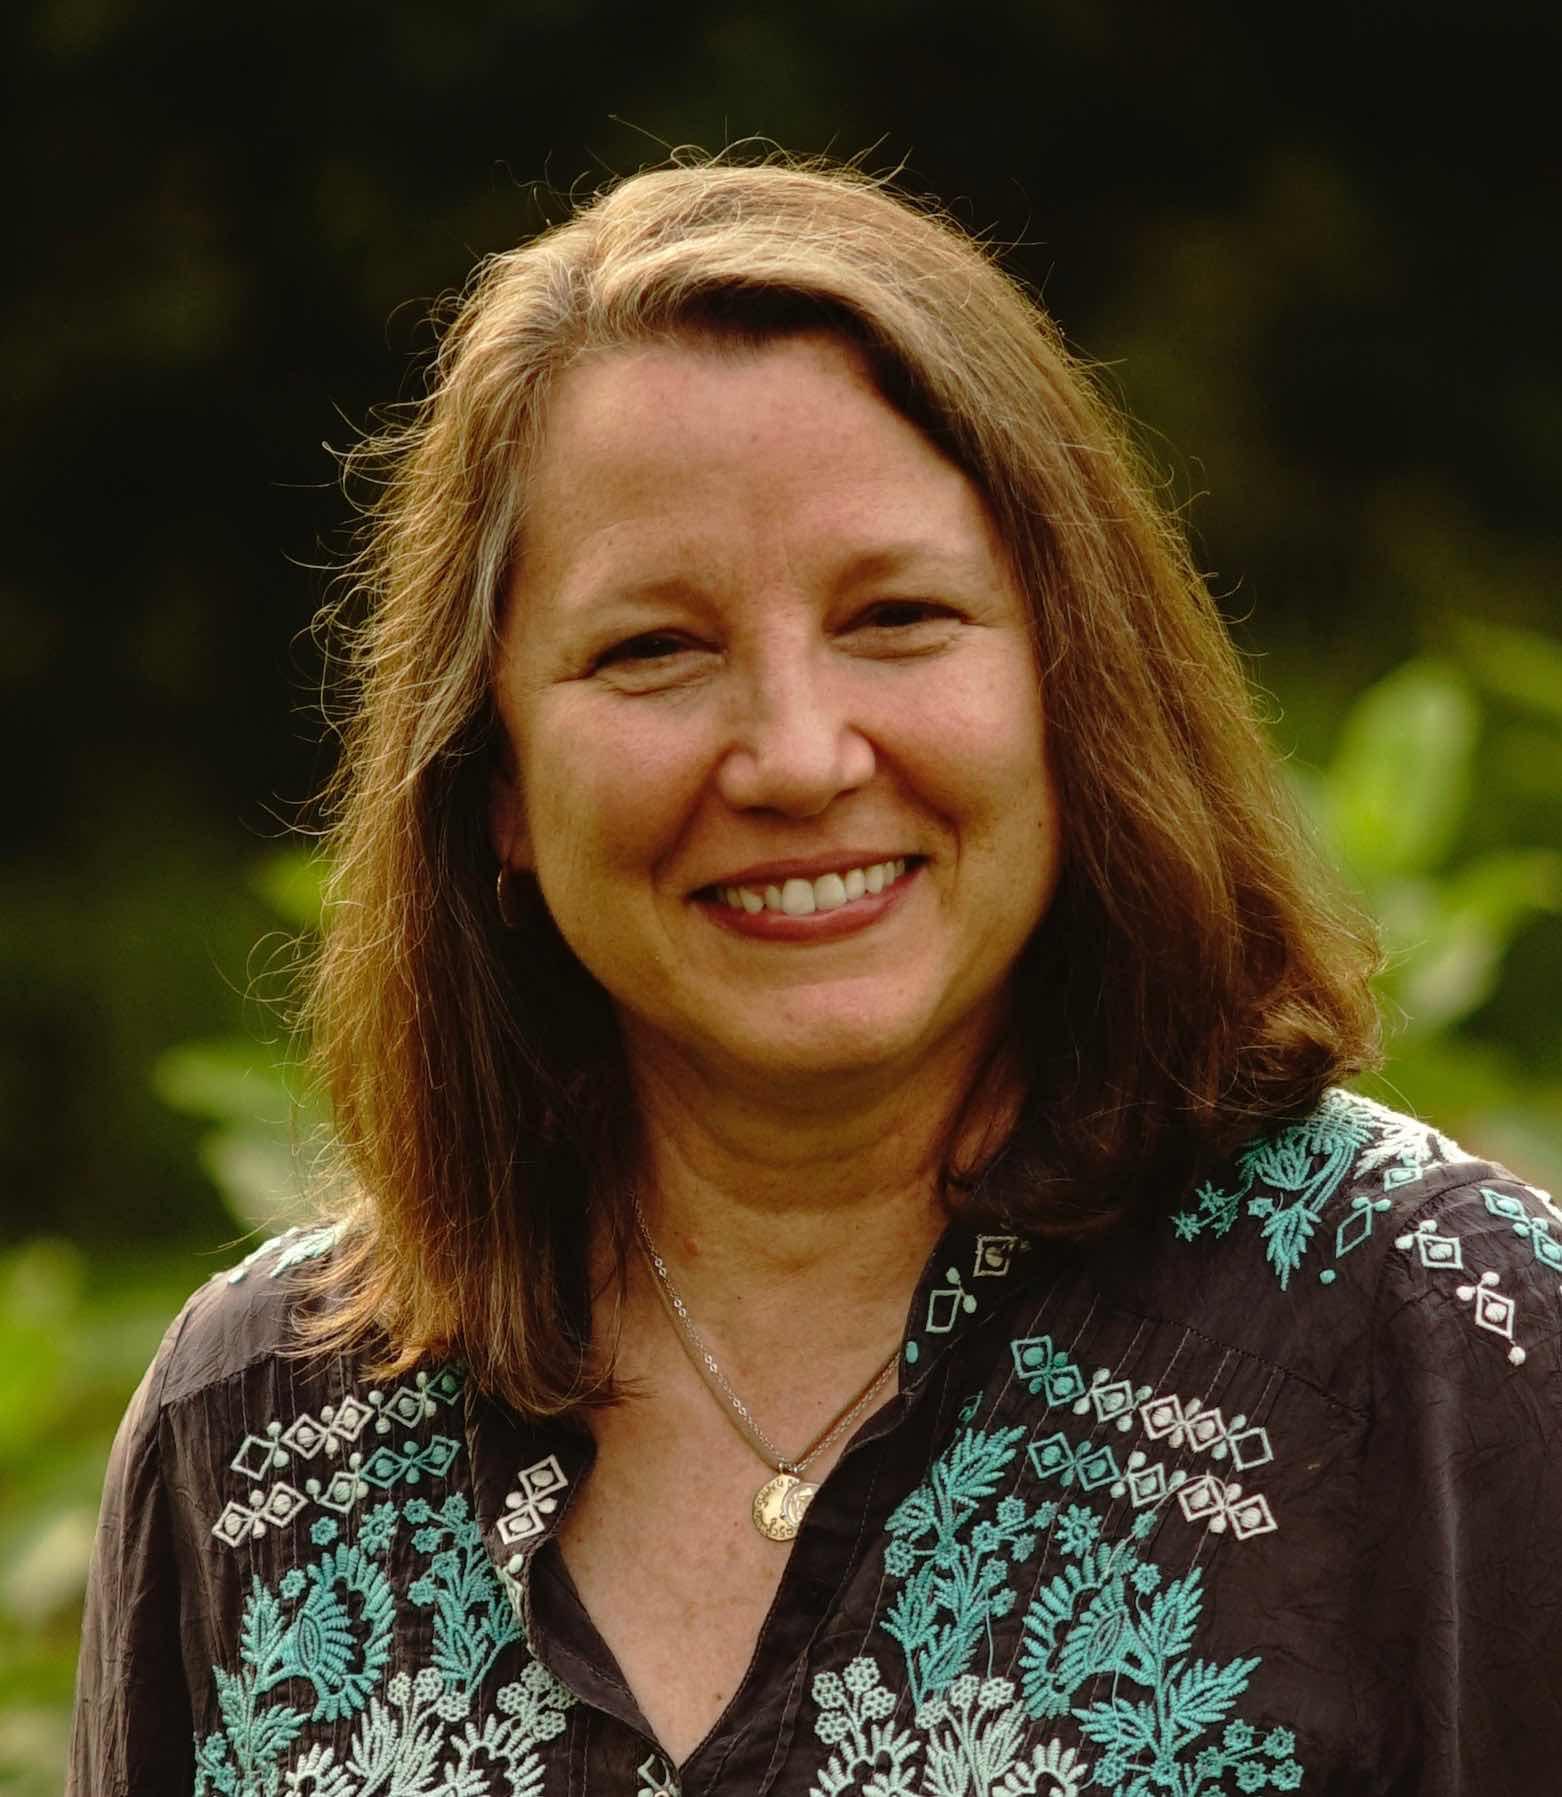 Marcy Vaughn